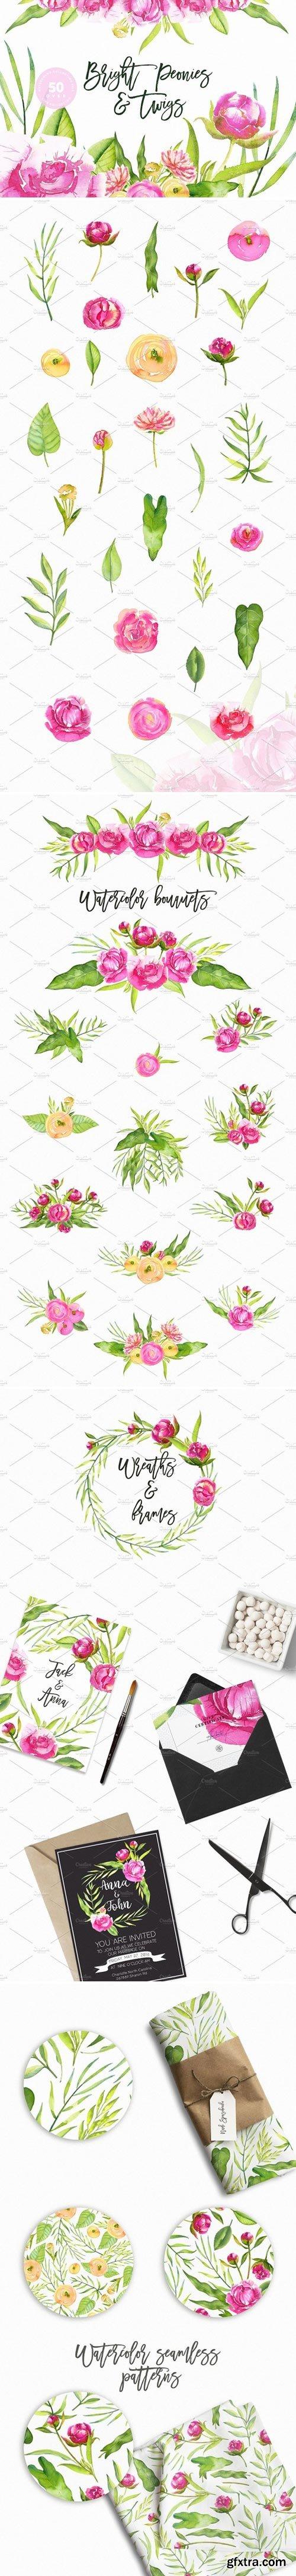 CM - Watercolor Bright Peonies & Twigs 1598910